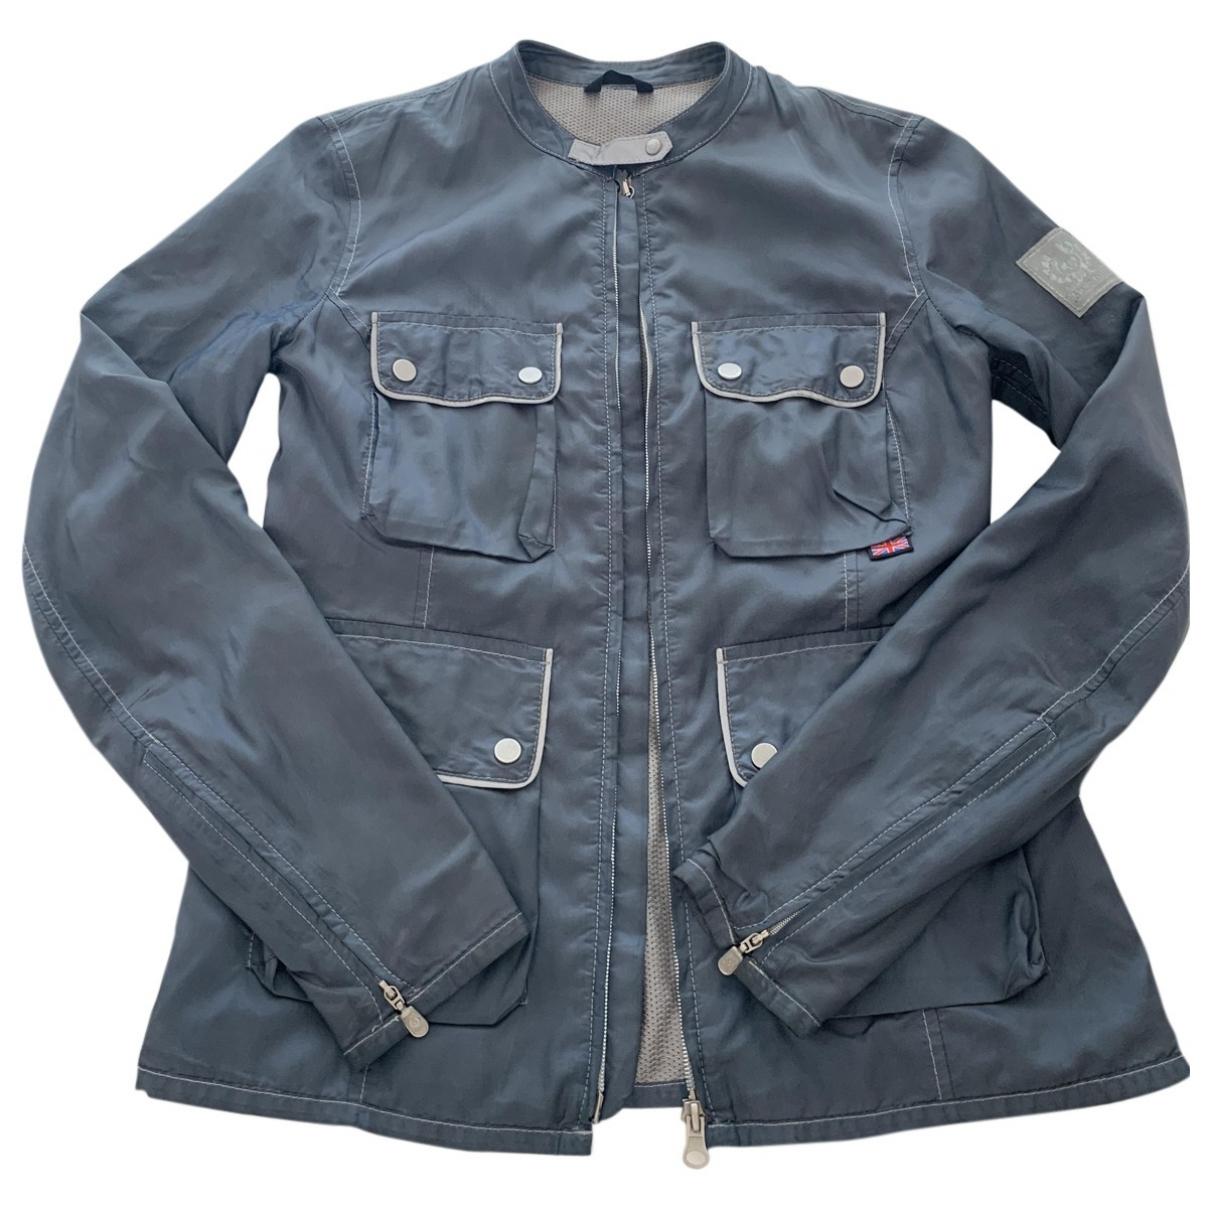 Belstaff \N Jacke in  Blau Polyester